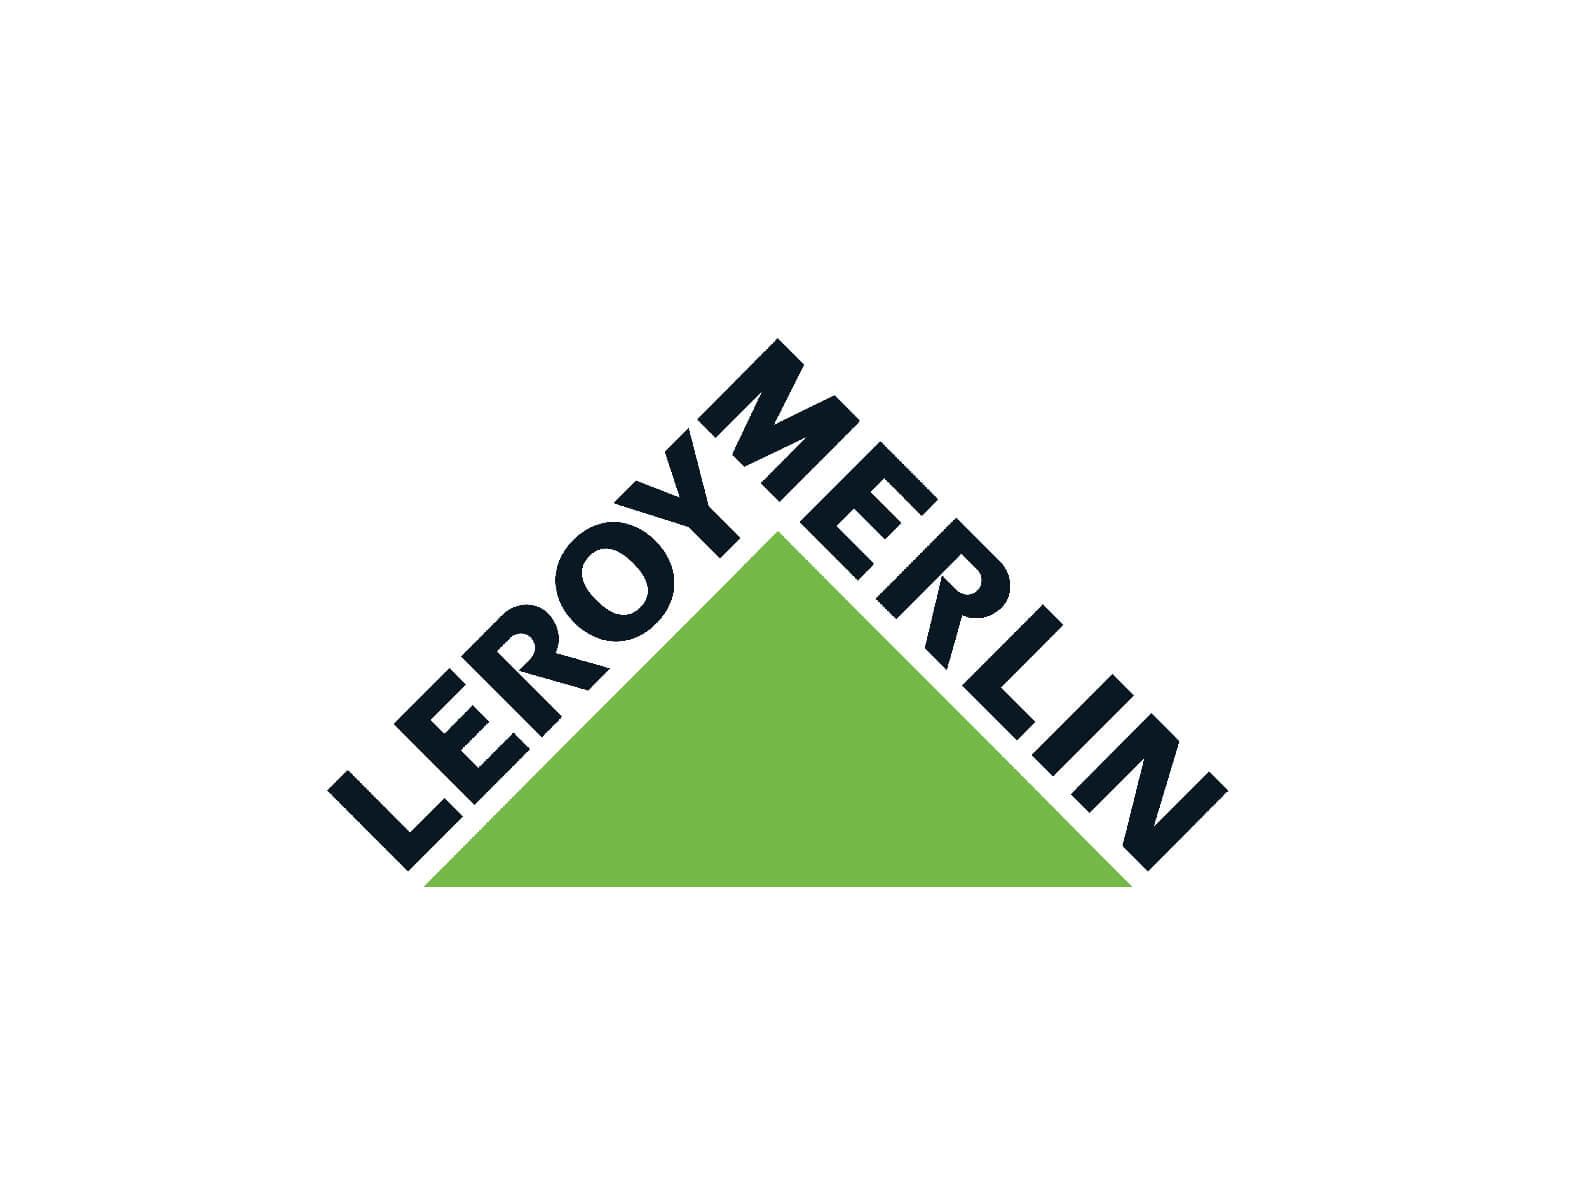 agence kayak communication web lille nord leroymerlin